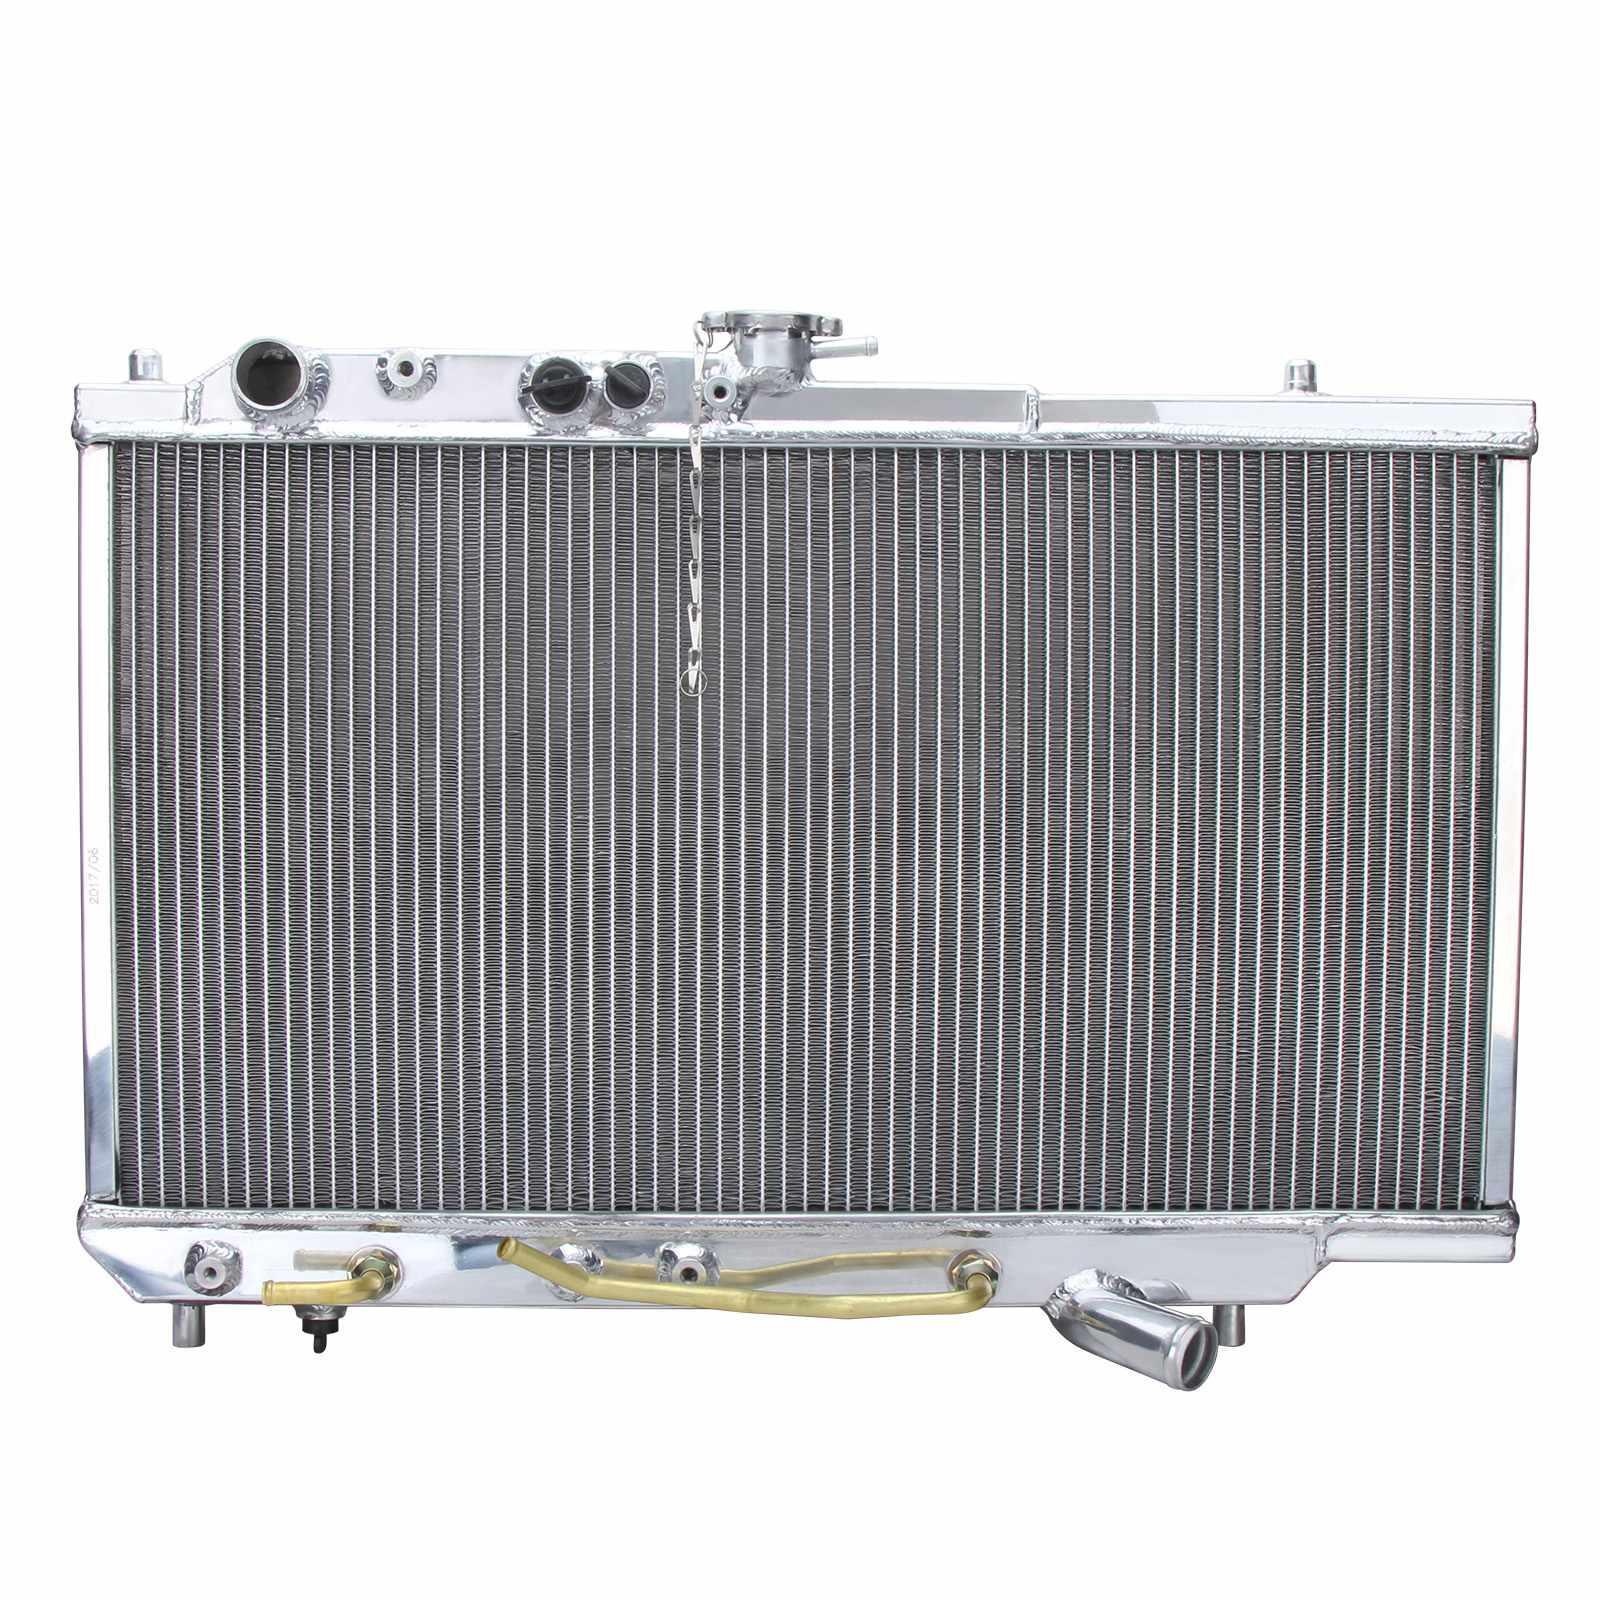 Full Aluminum Radiator for Mazda K323 Protege Asrina Ba 1989-1990 B55715-200D/at/mt